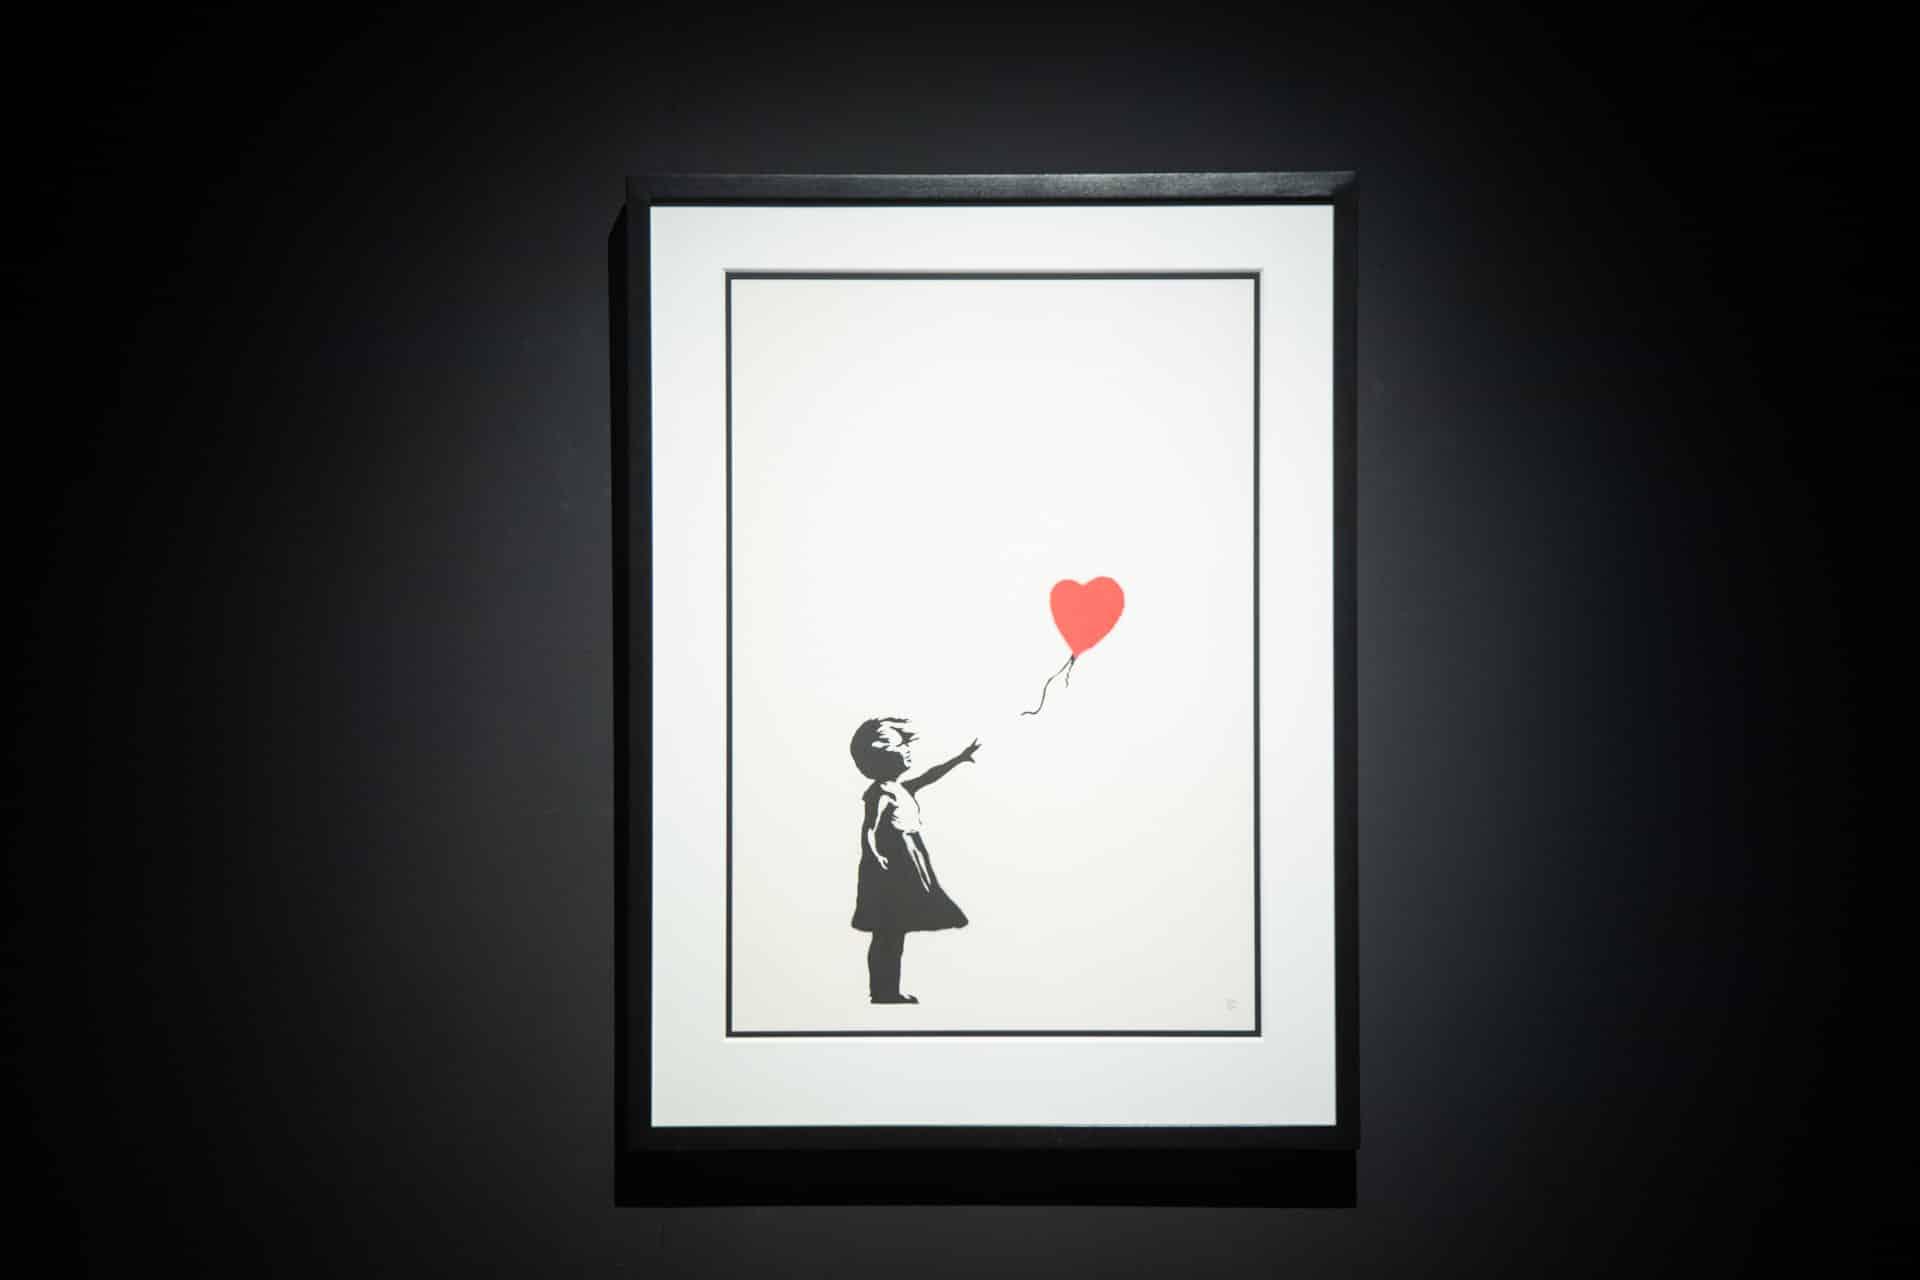 「Banksy: Genius or Vandal」世界巡迴展覽香港站 「女孩與氣球」(Girl with Balloon)